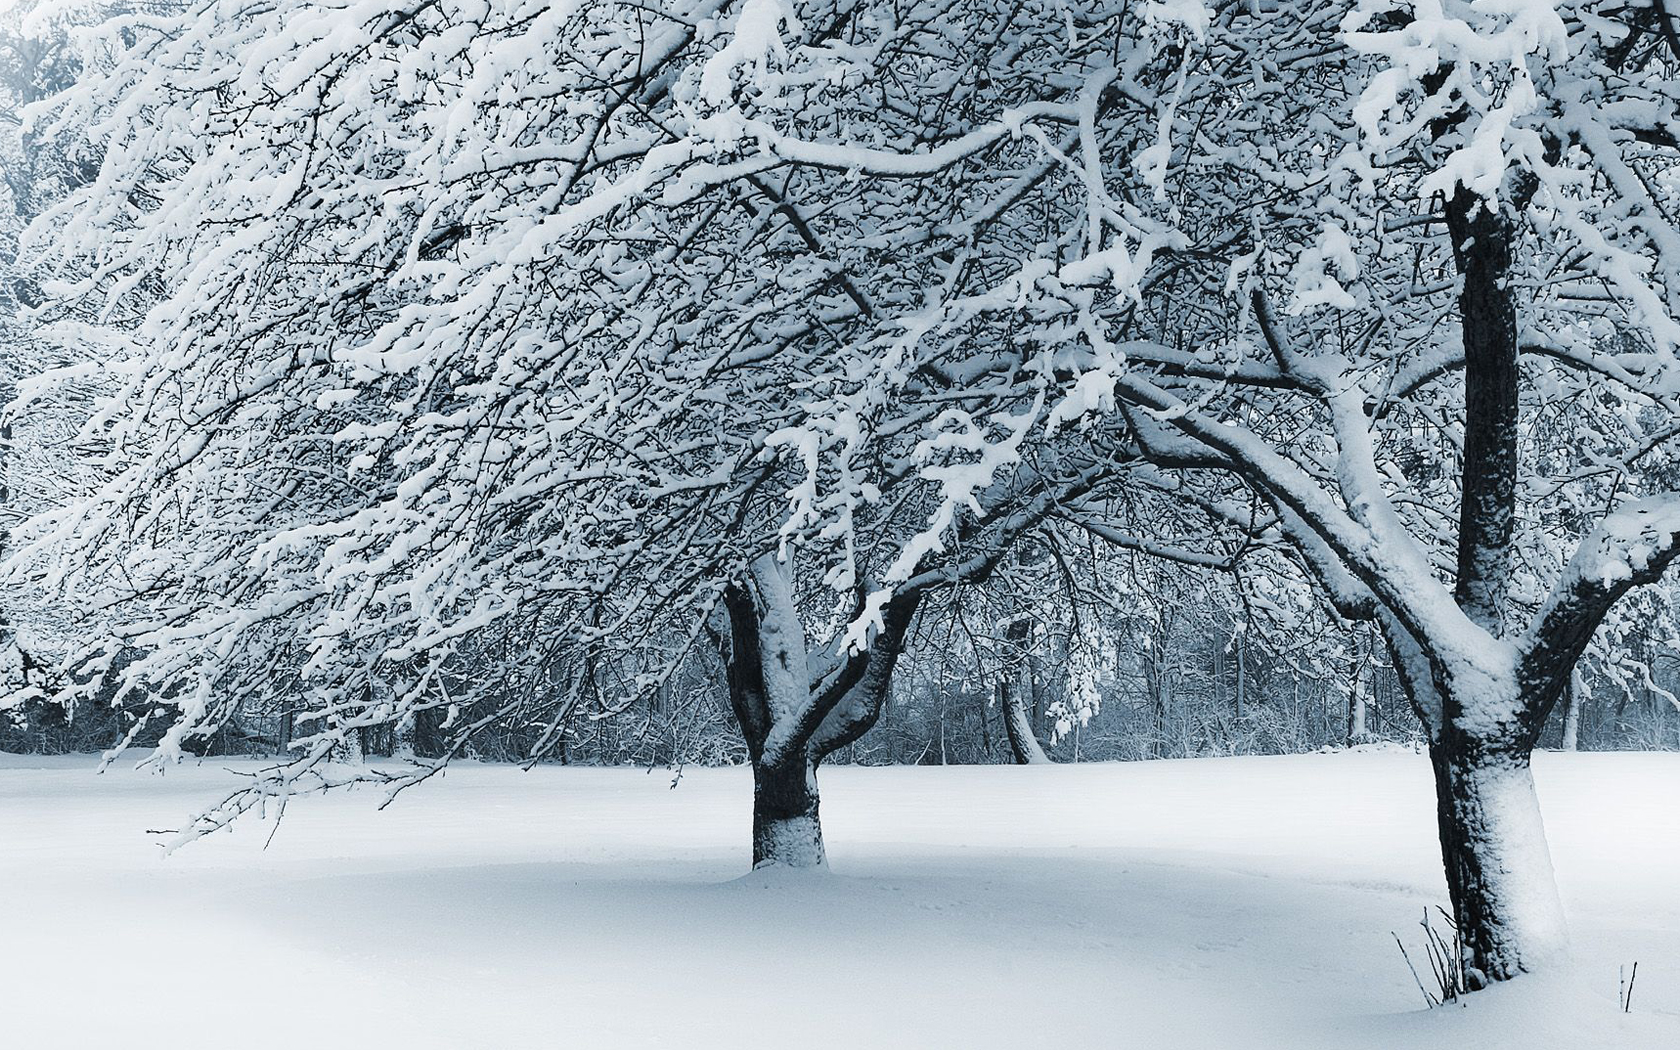 Snowy forest scene photography wallpaper Desktop Background Scenery 1680x1050